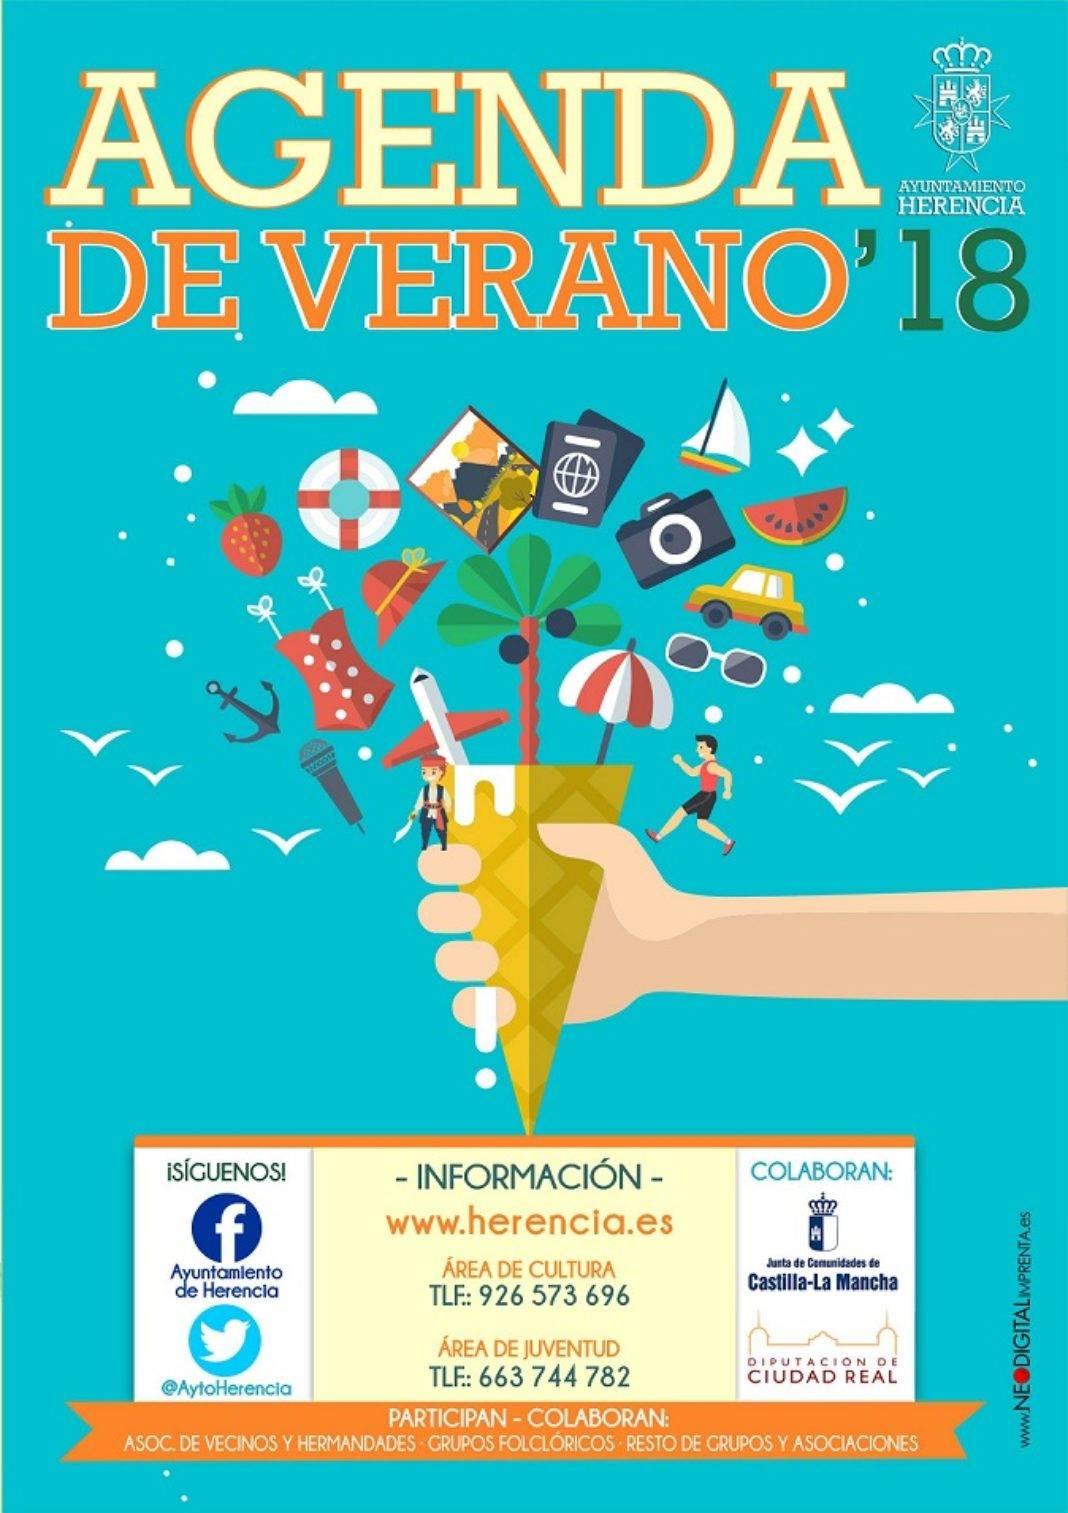 Herencia agenda cultural de verano 1068x1513 - Presentada la agenda cultural para el verano en Herencia